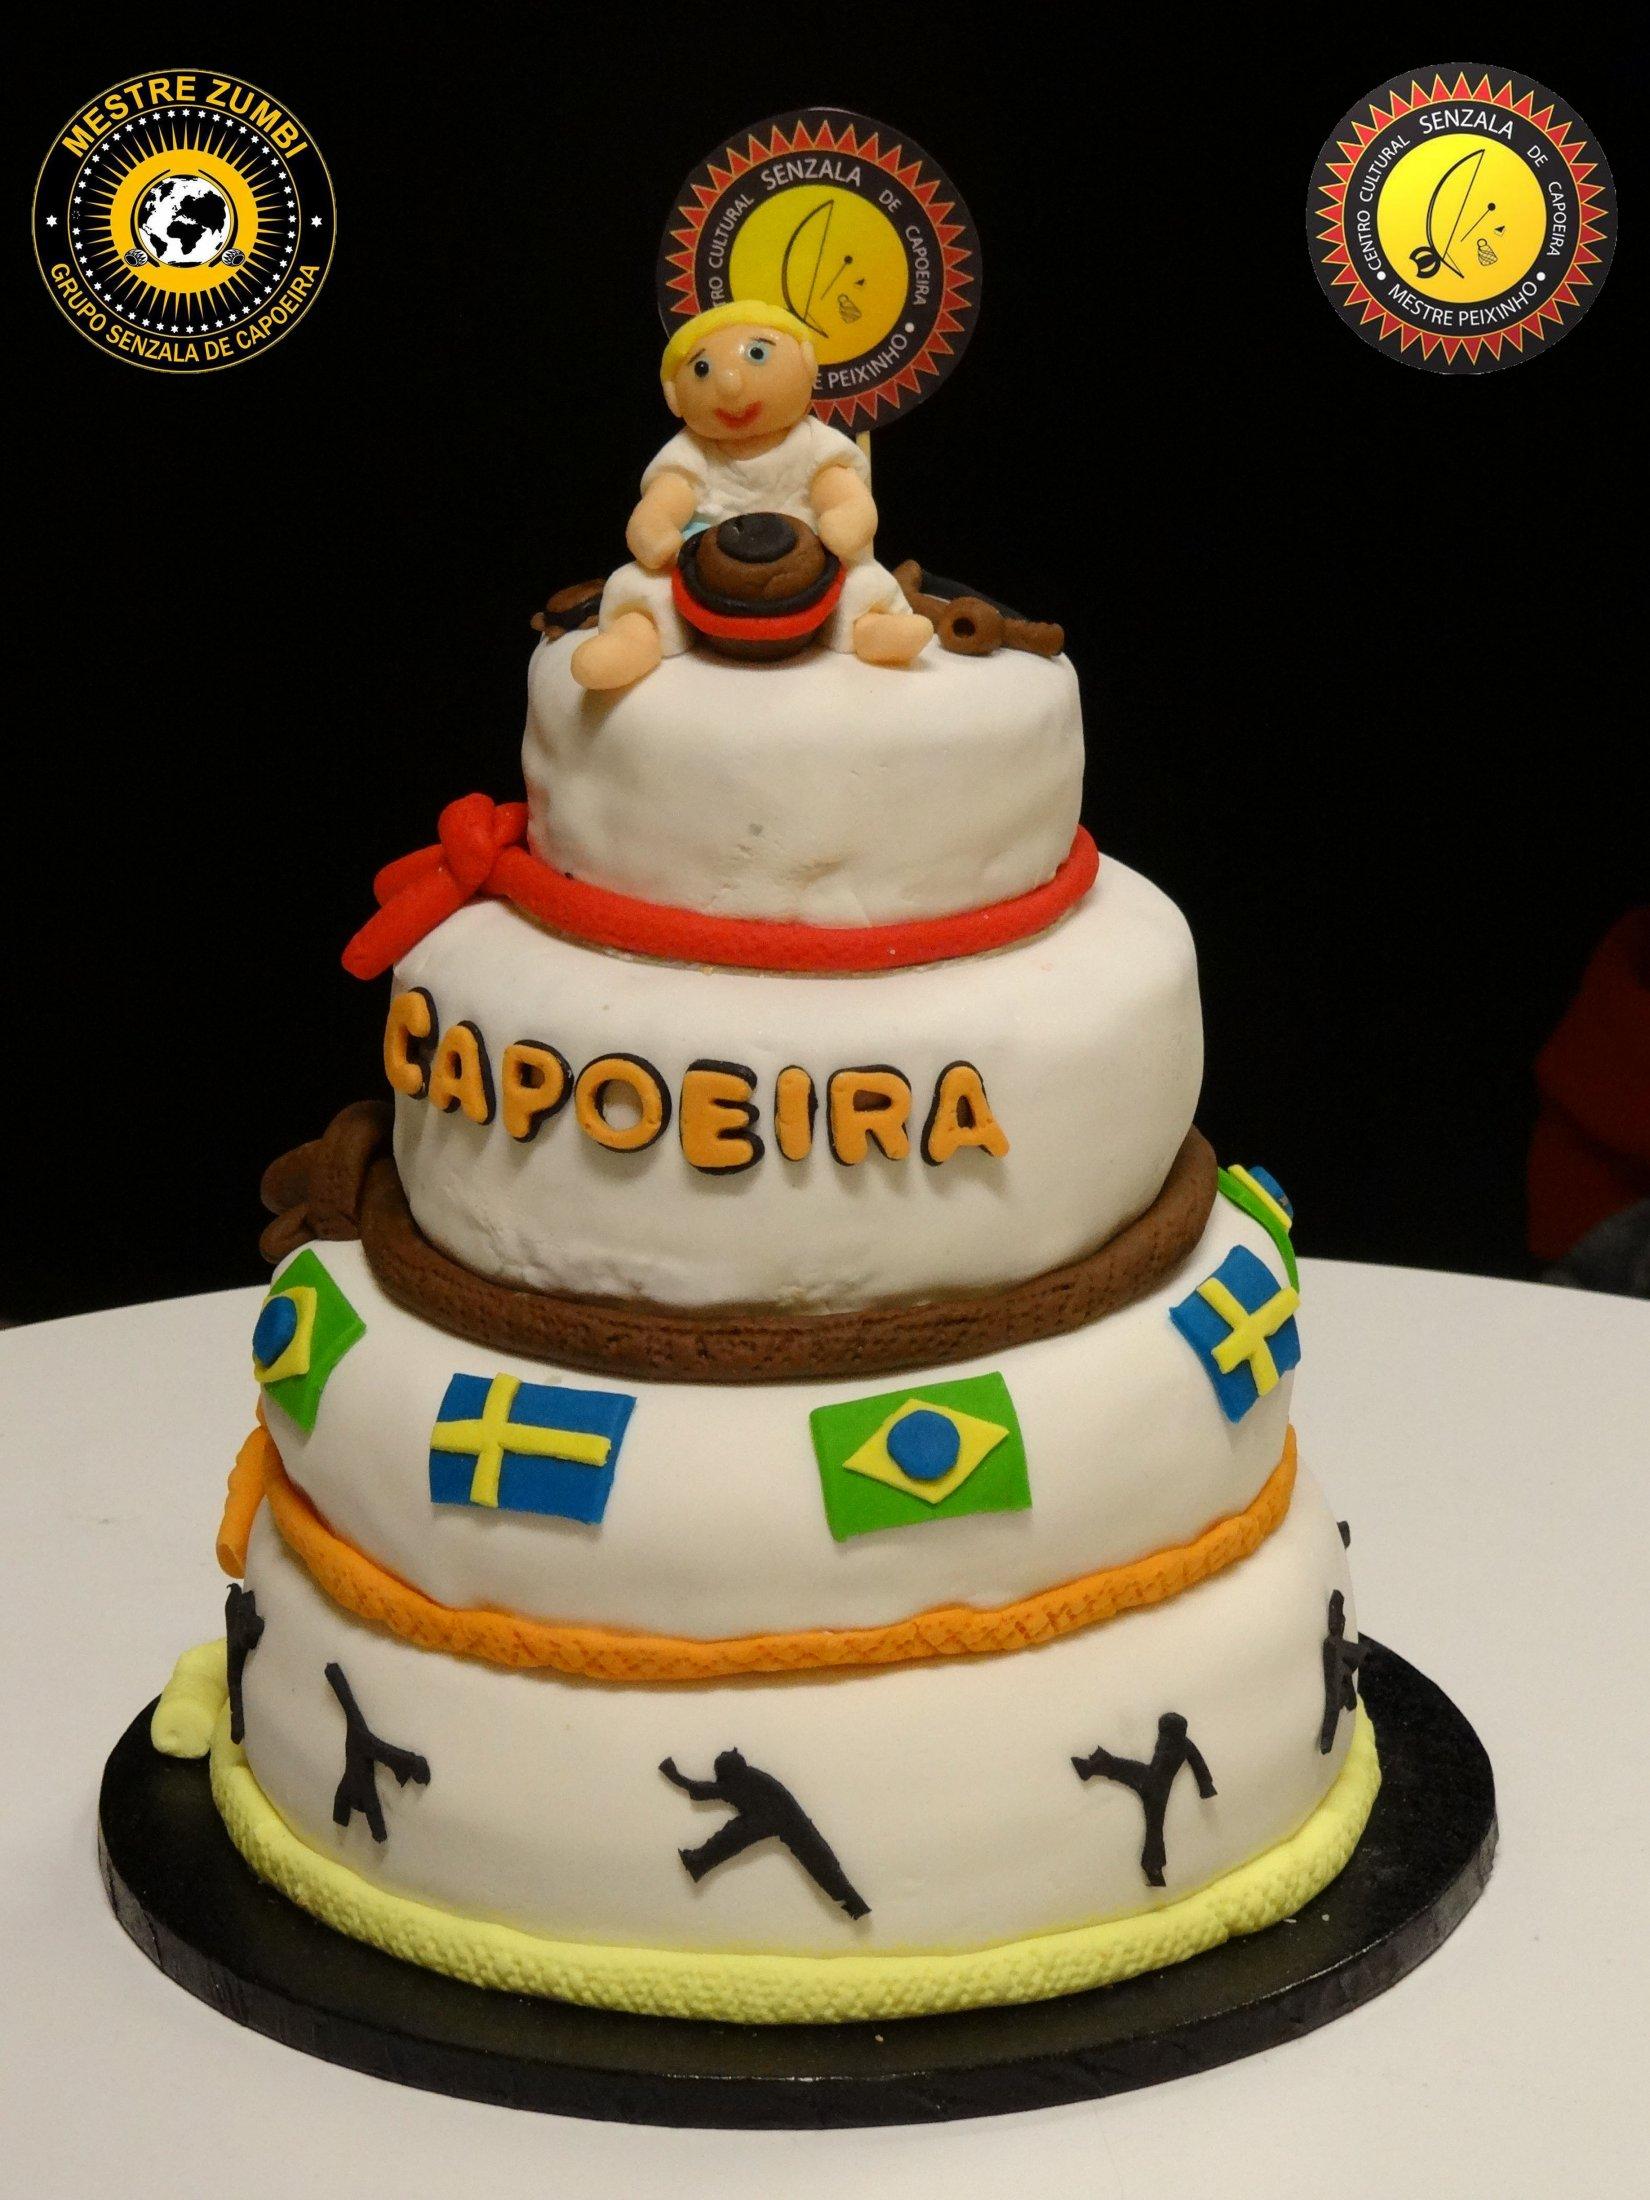 2013-12-14 - Capoeira 006